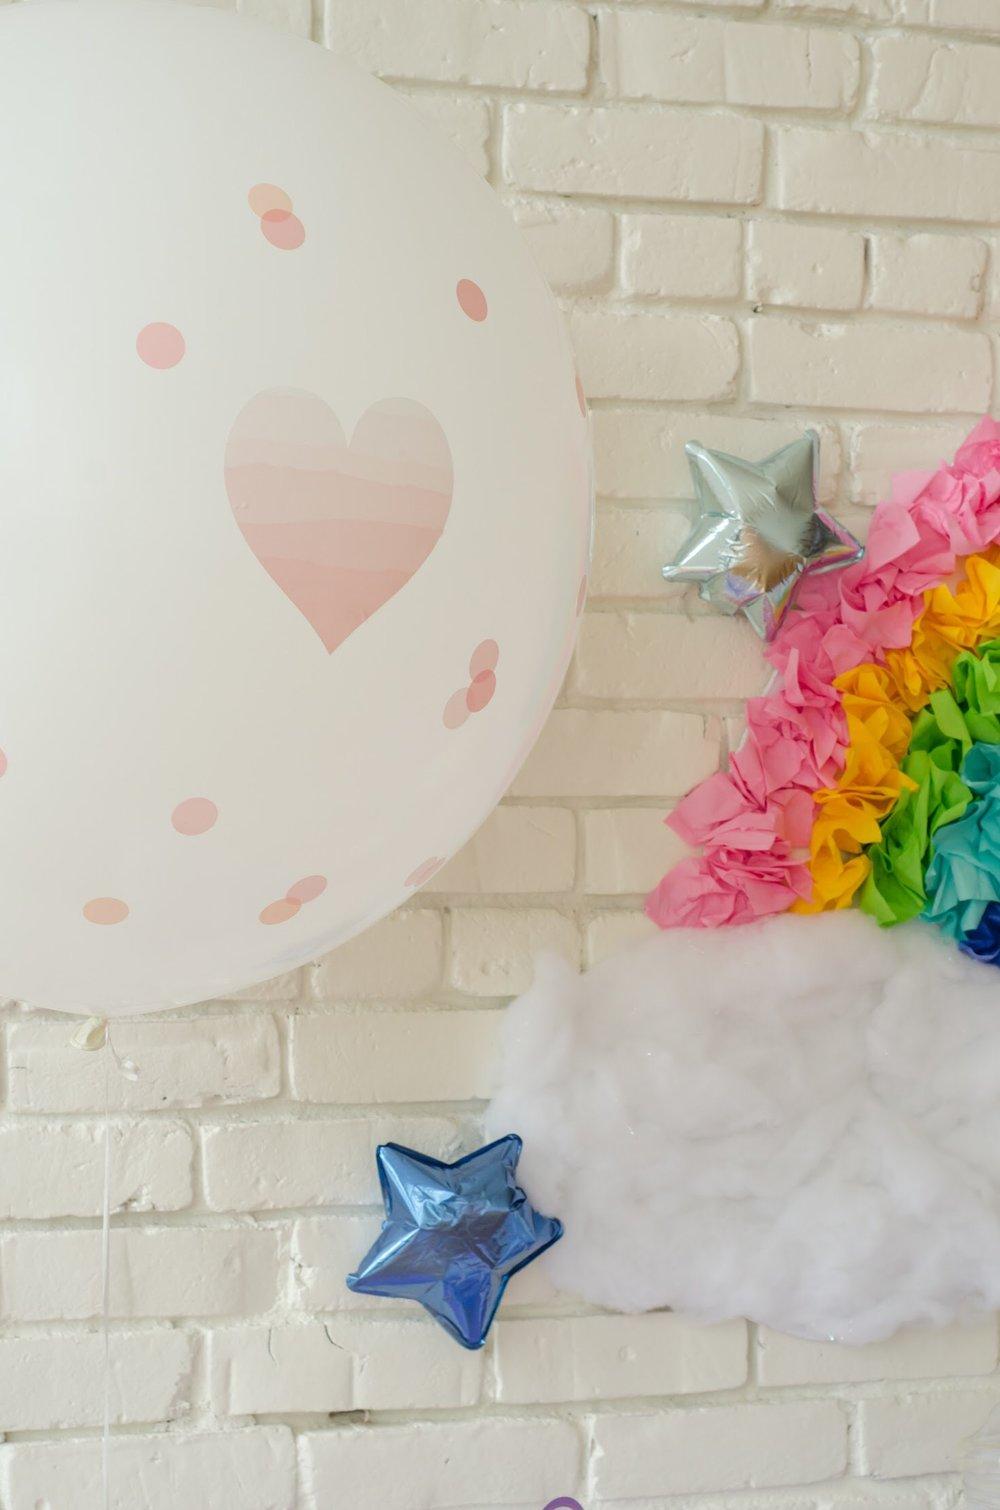 Cute balloons at unicorn birthday party. Come see all the Unicorn Birthday Party Ideas at Mint Event Design www.minteventdesign.com #unicornparty #birthdayparty #birthdaypartyideas #pastelrainbow